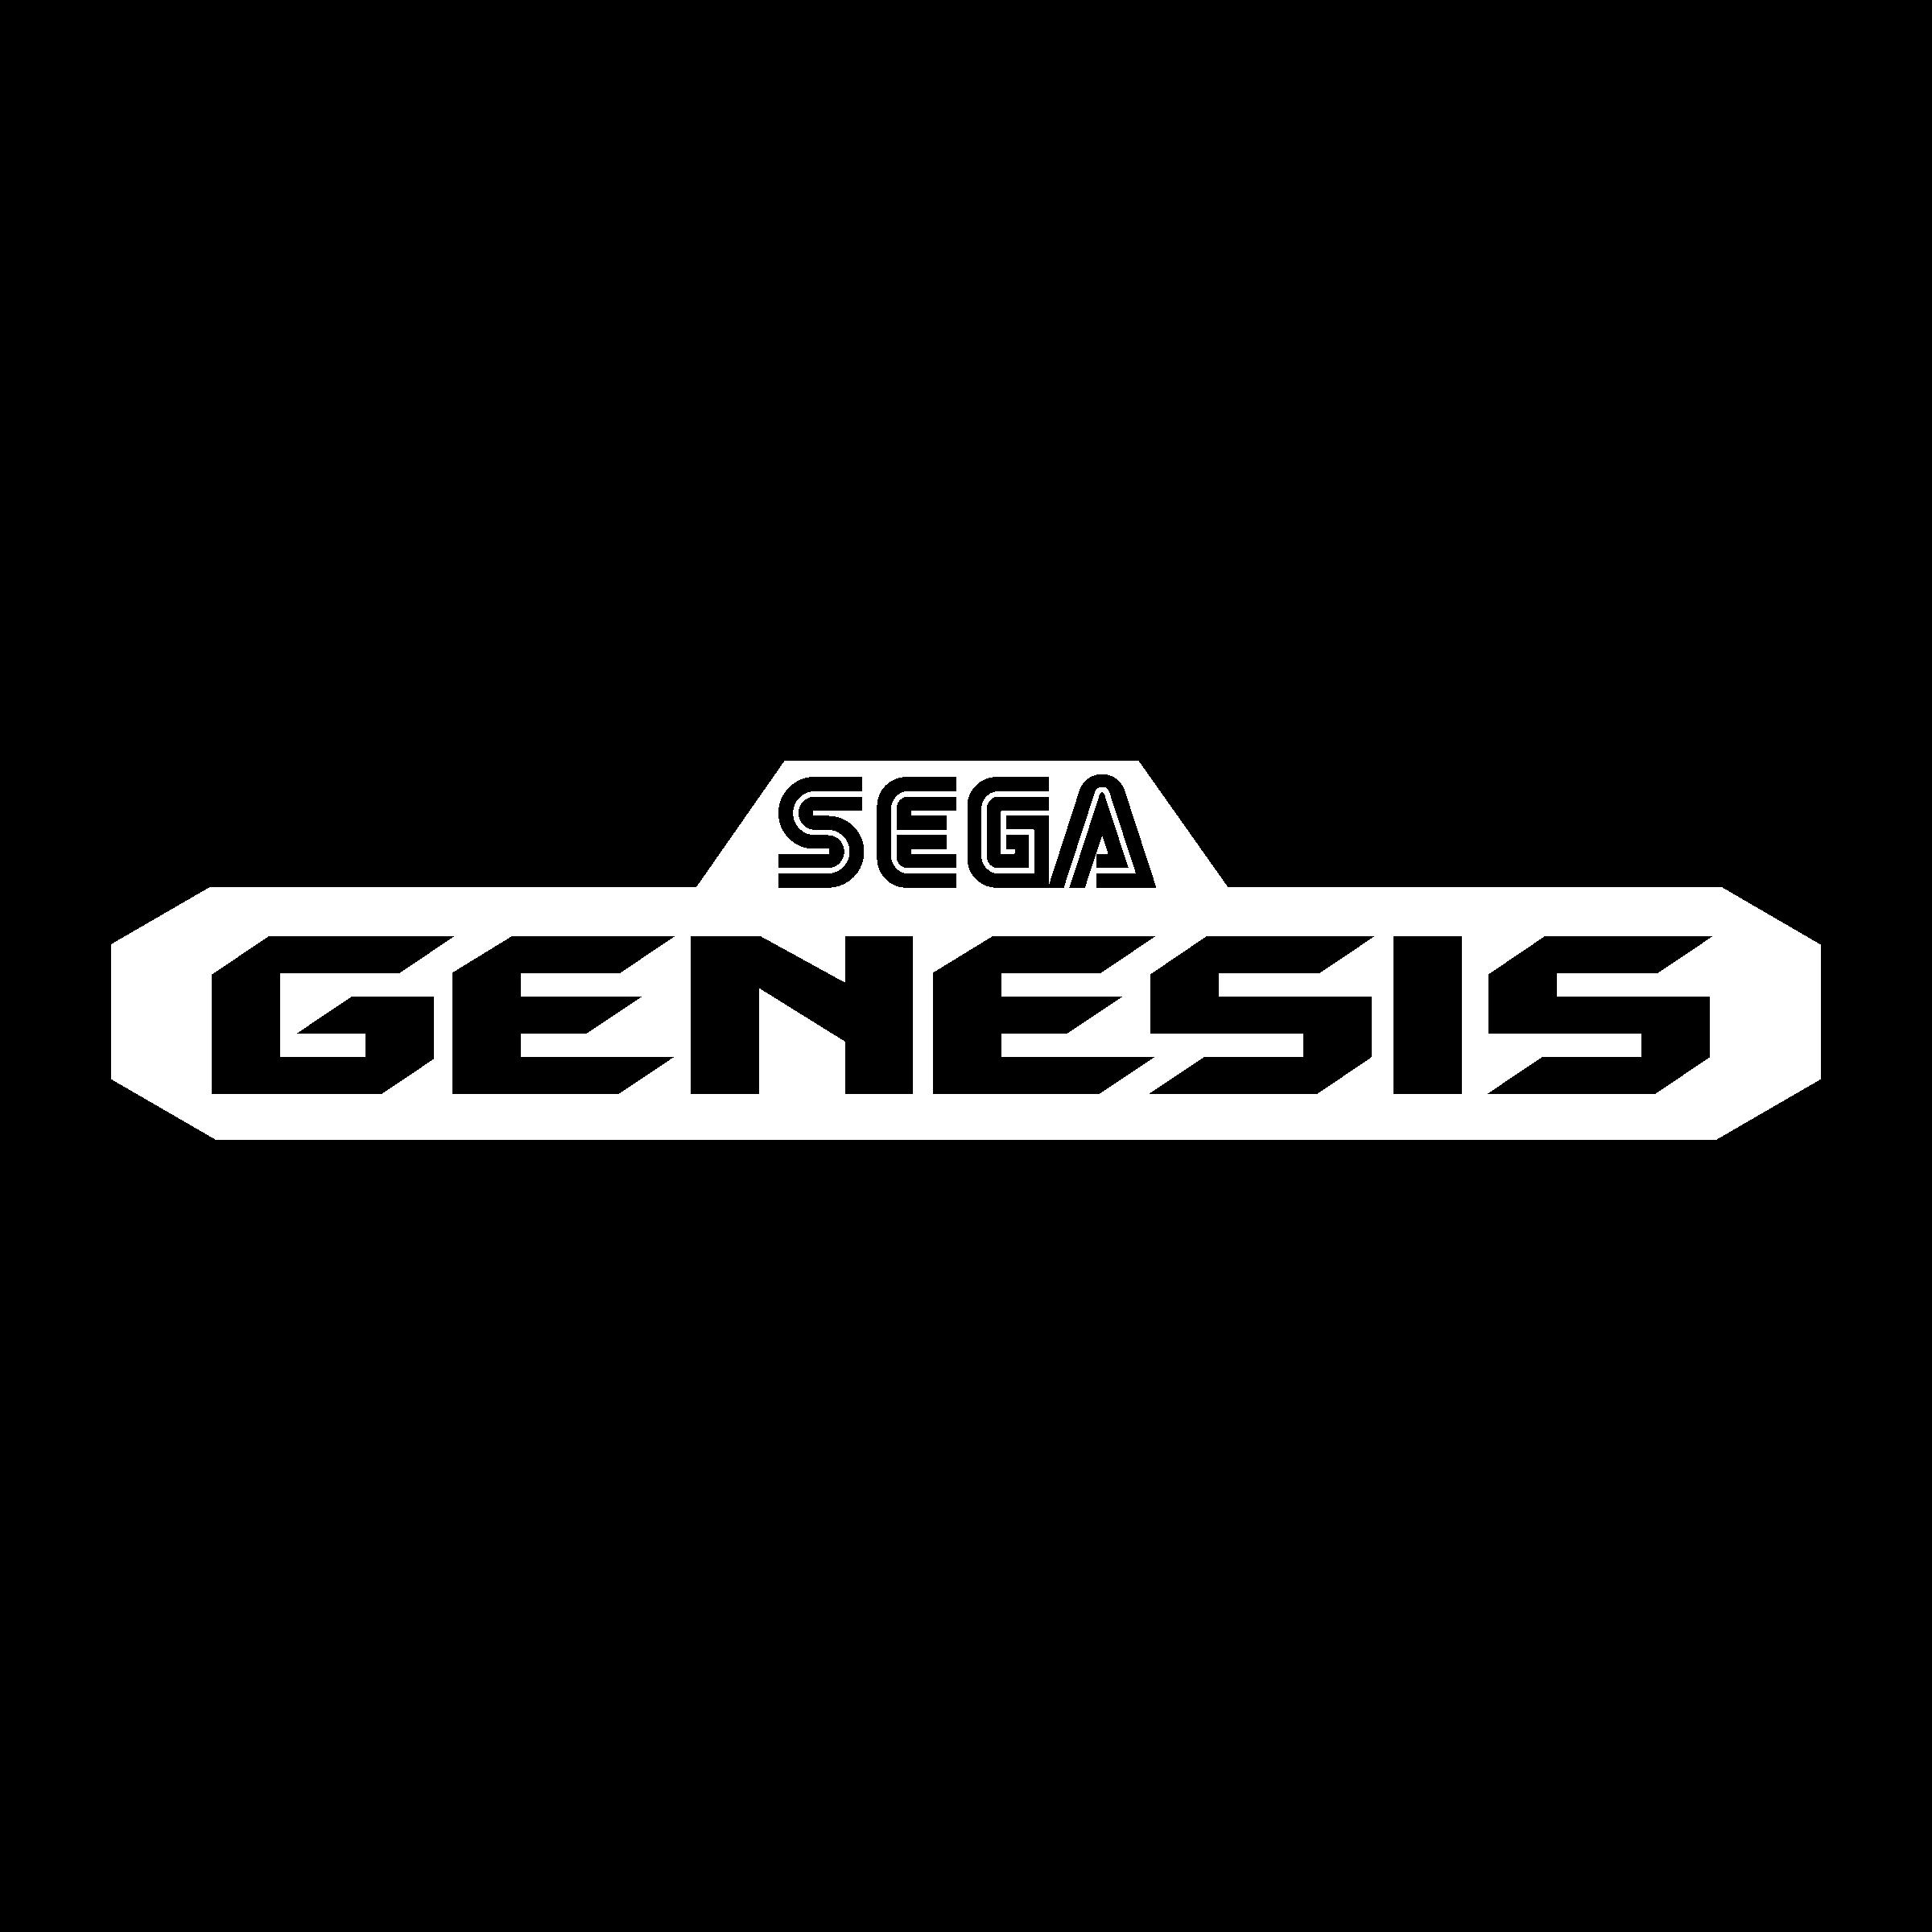 Genesis Logo PNG Transparent & SVG Vector.